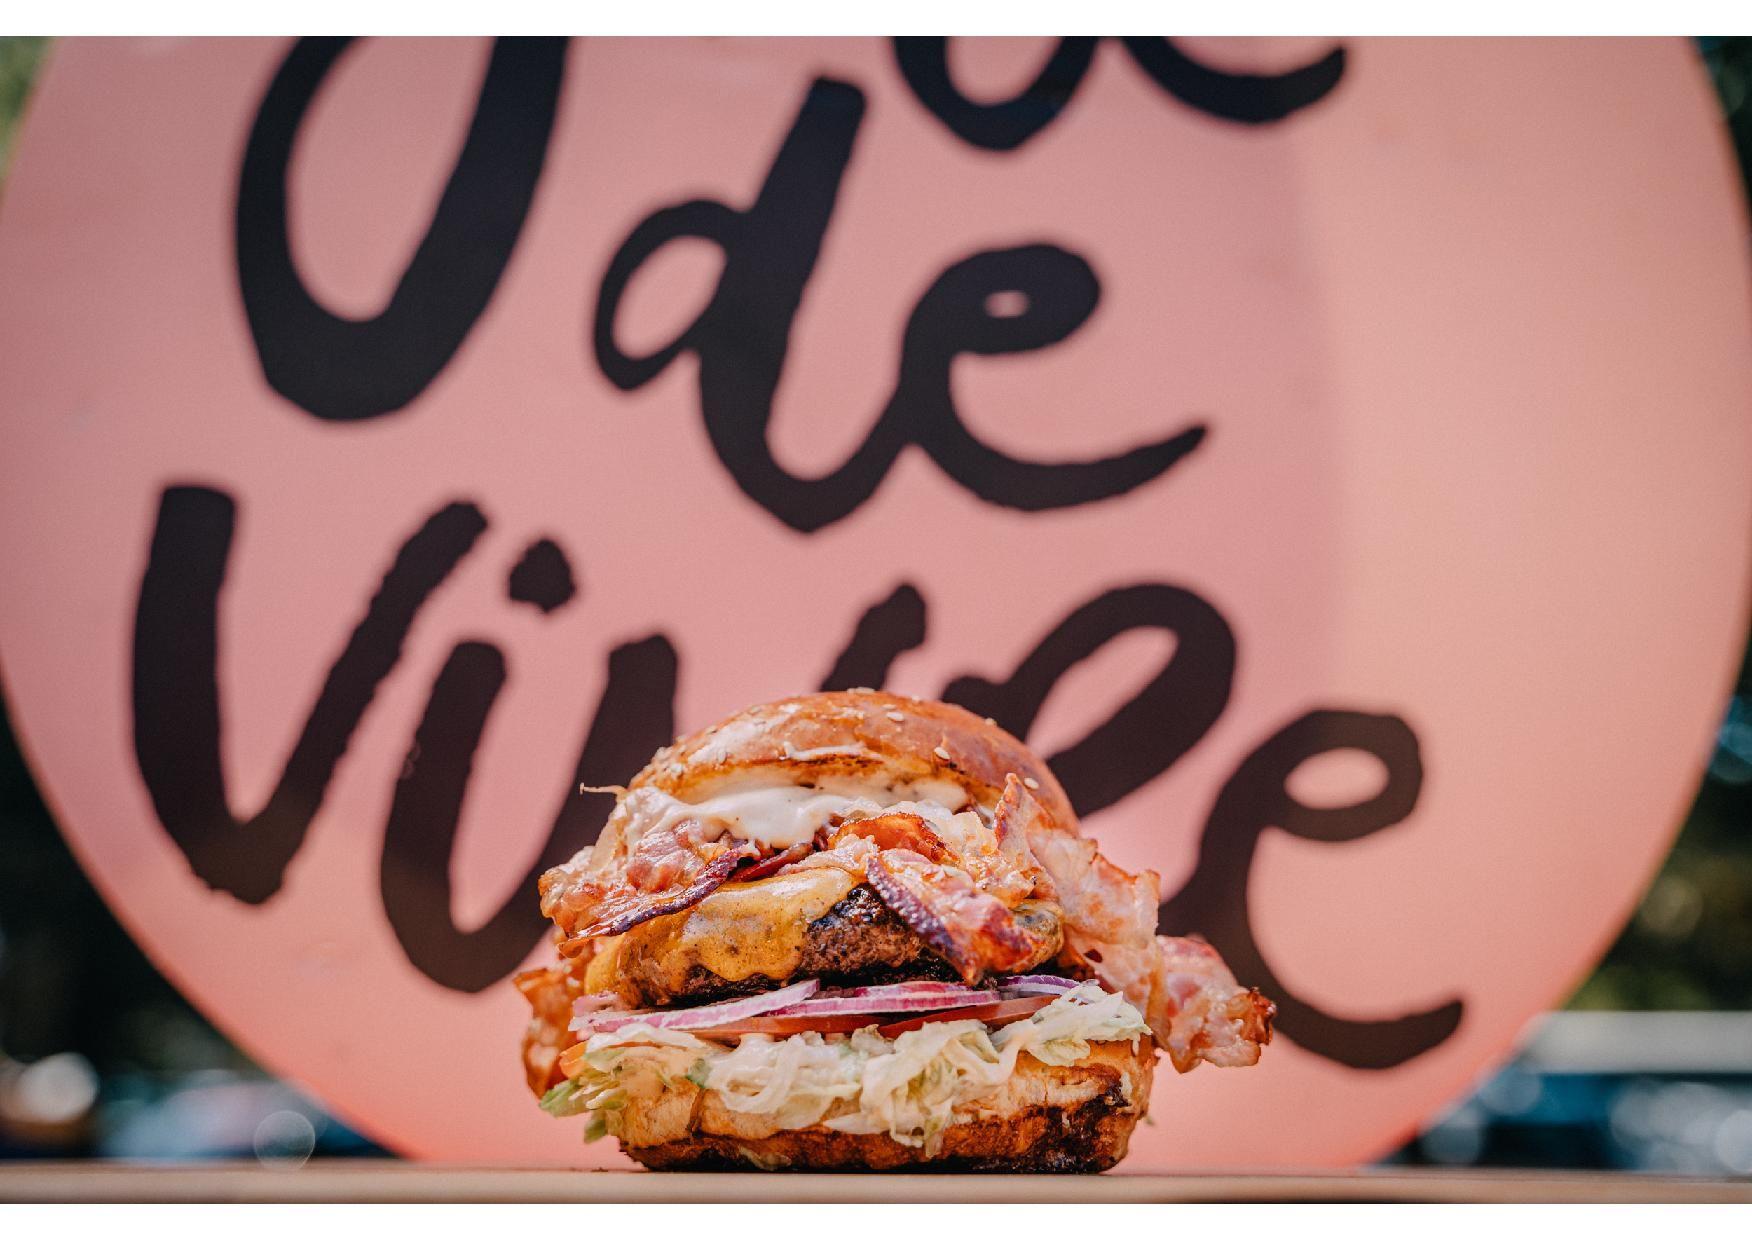 Burgermanija zavladala zagrebačkim Trgom dr. Franje Tuđmana! Zagreb Burger Festival šesti je put otvorio svoja vrata